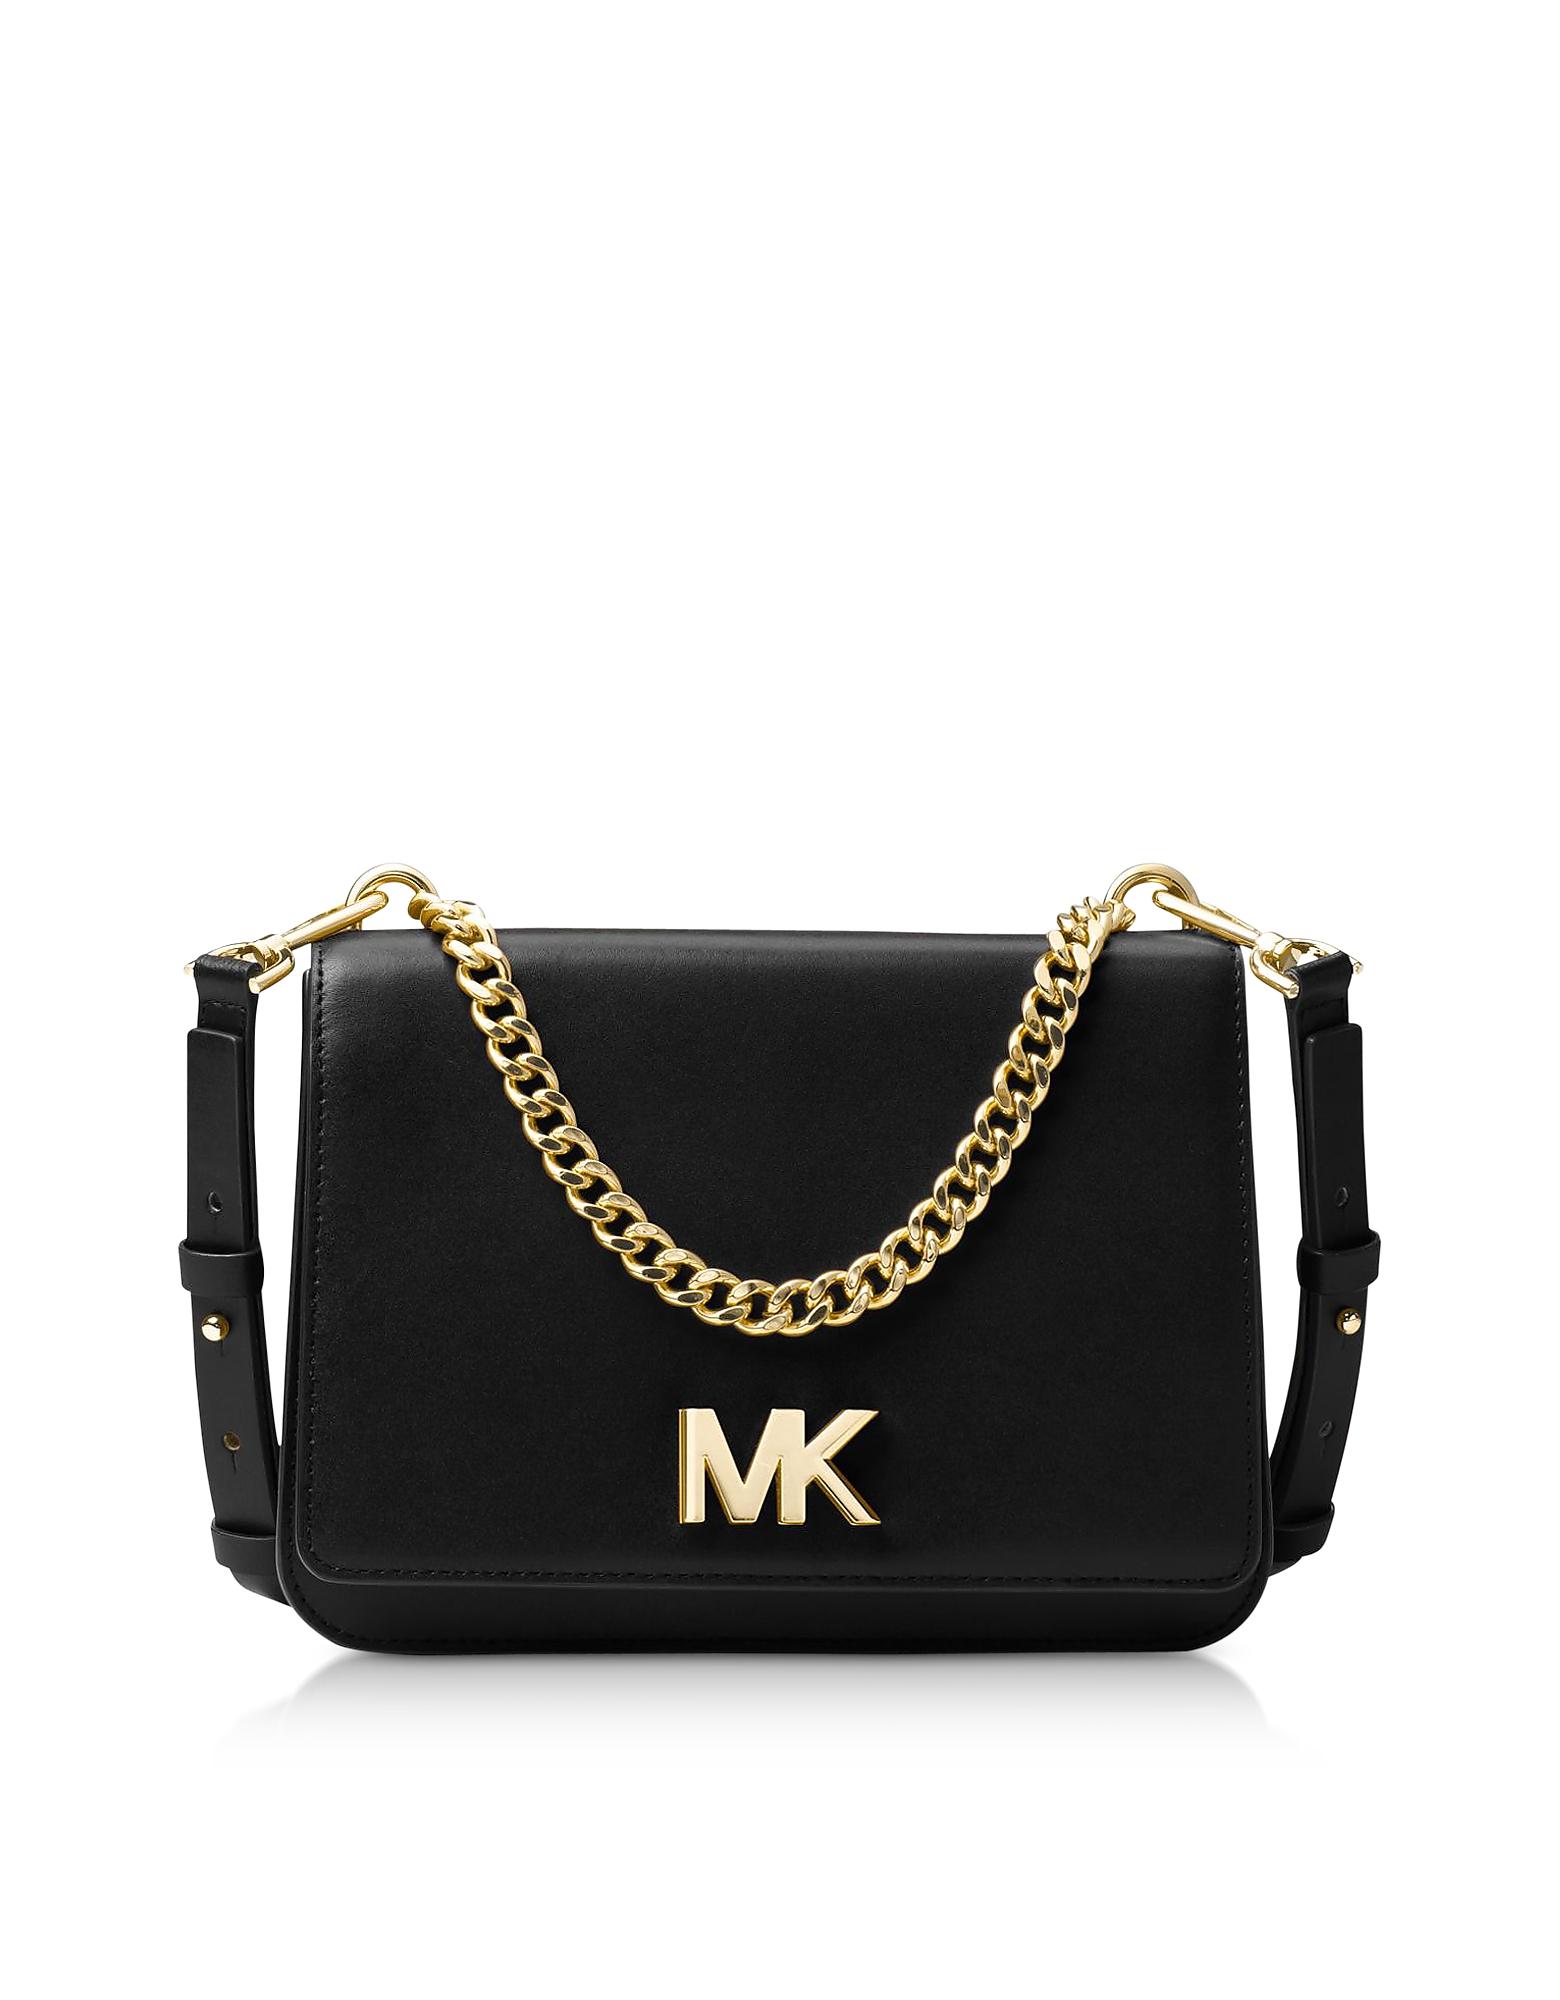 Michael Kors Handbags, Mott Leather Crossbody Bag